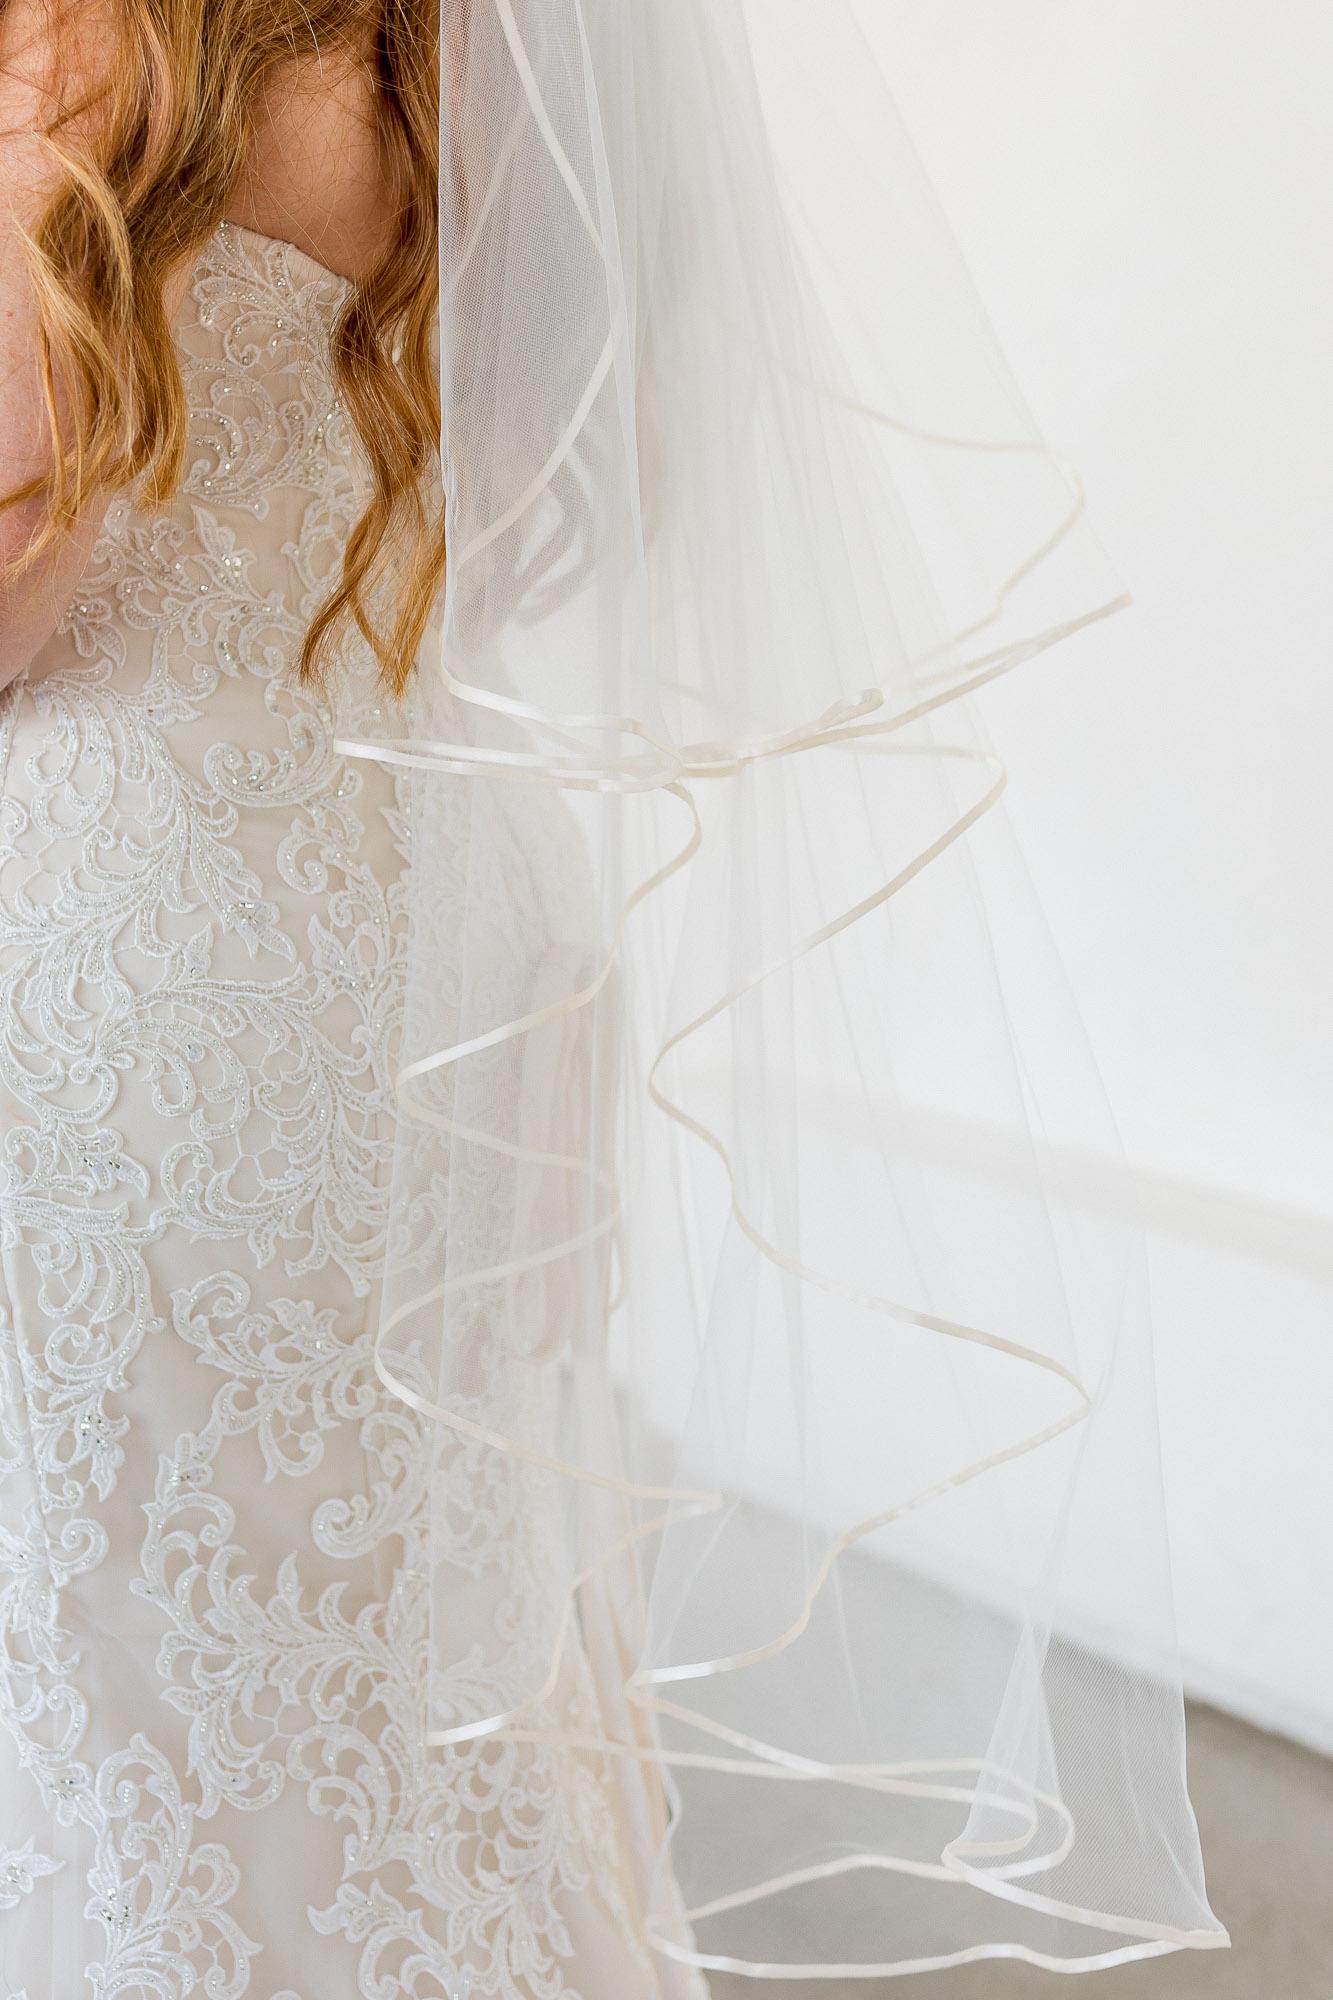 Heather_Pat_San_Marcos_Lakehouse_Wedding_206.jpg